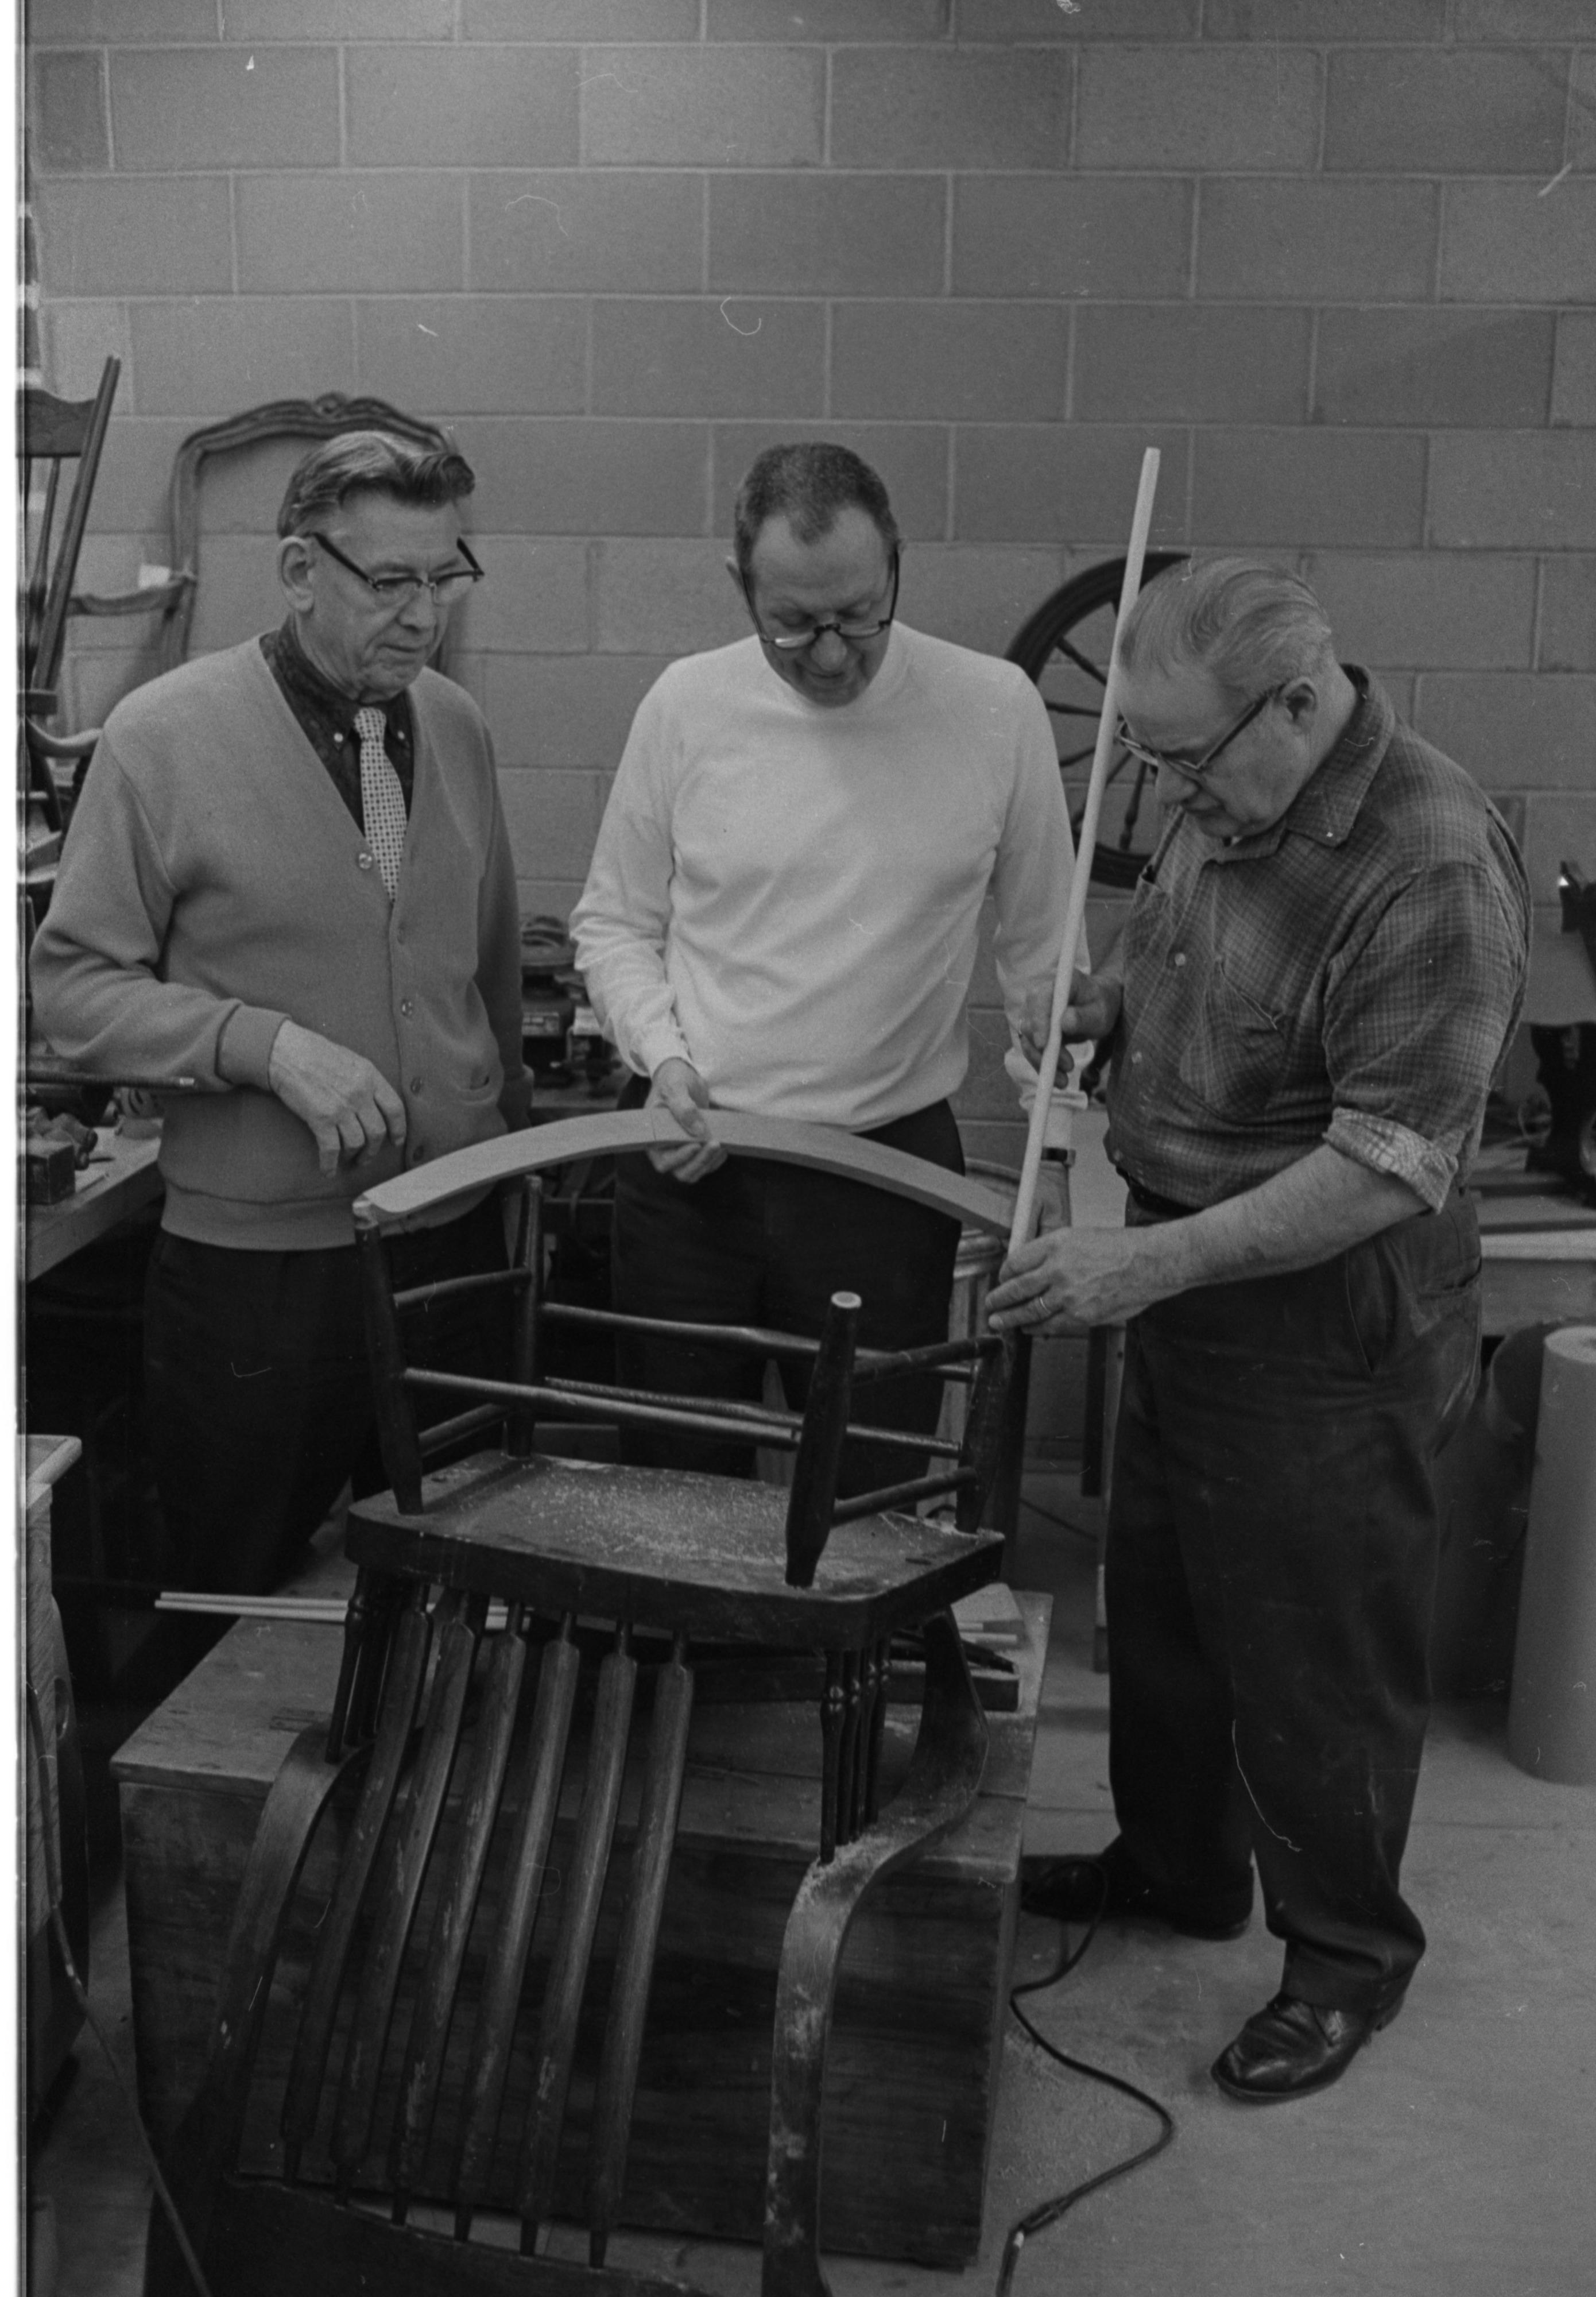 Kiwanis Club Members Repair Toys And Furniture For Ann Arbor Public Schools March 1969